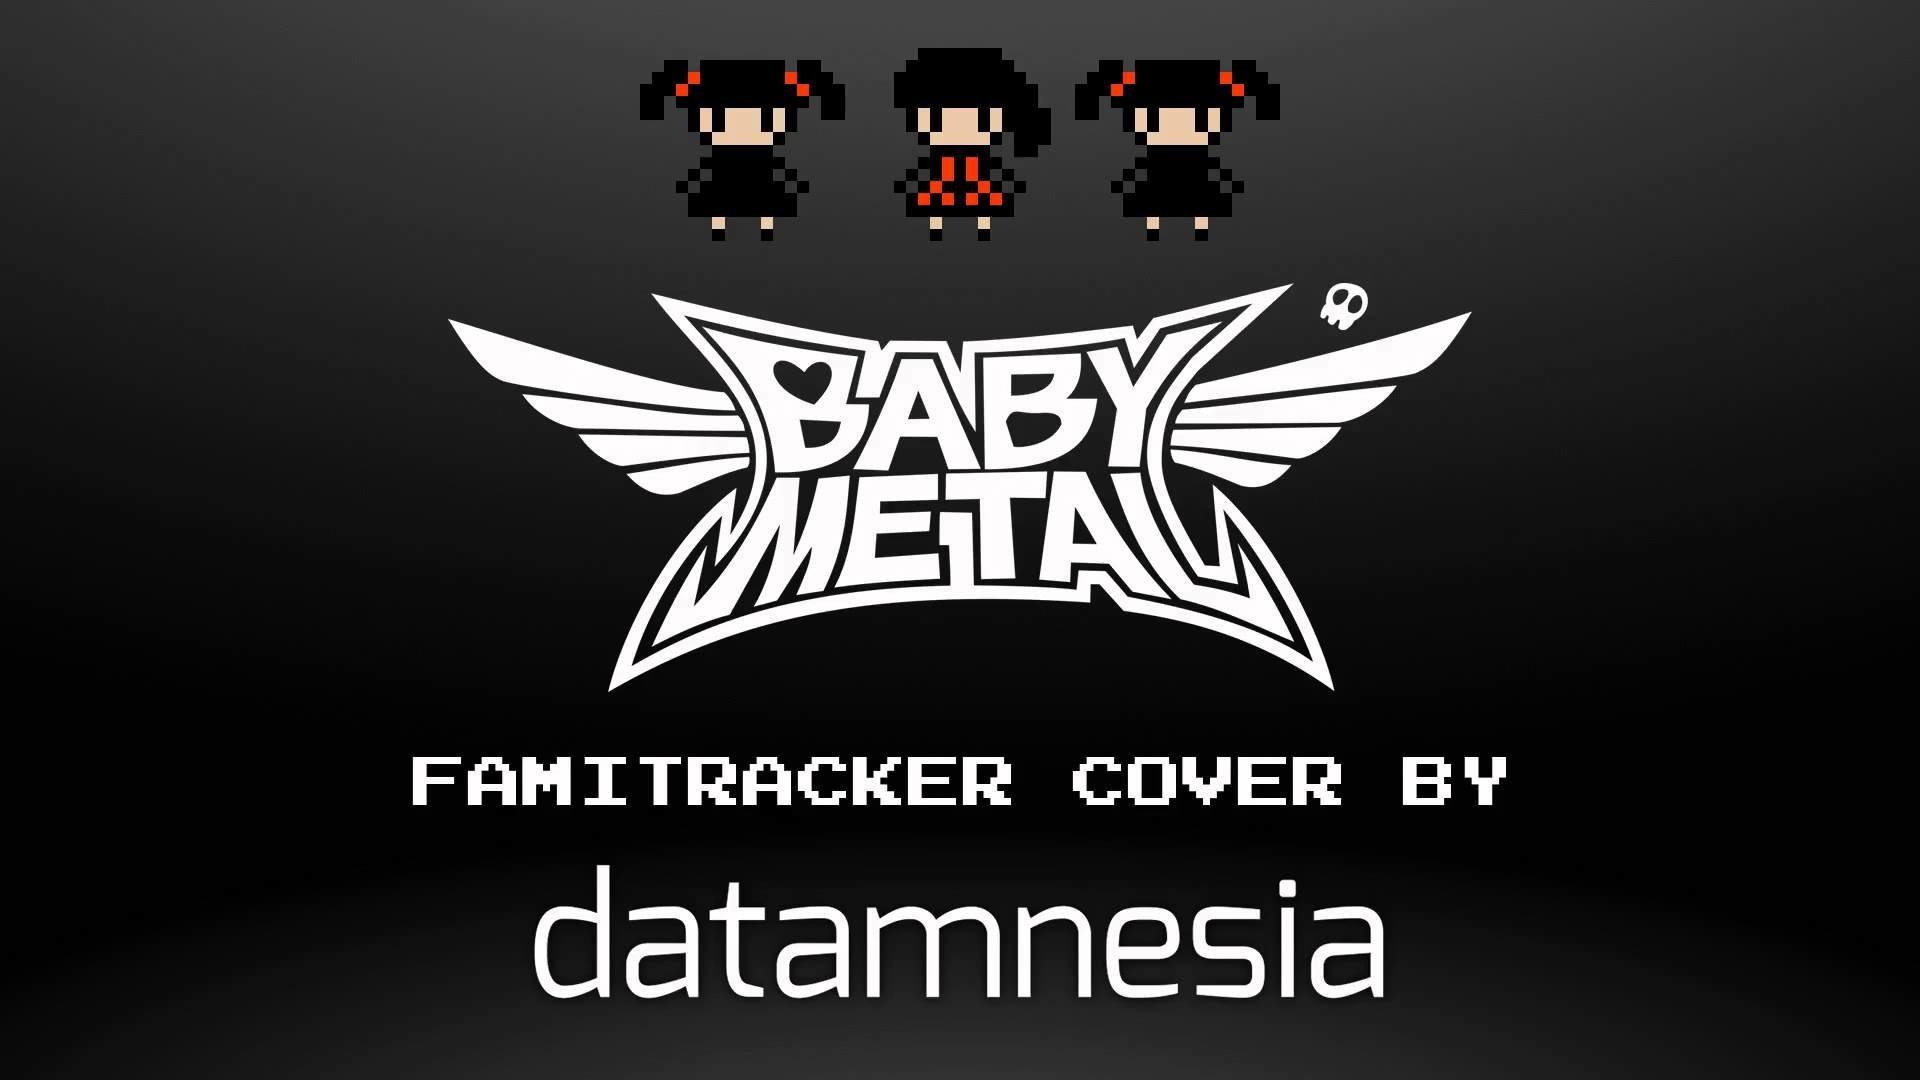 [FREE DOWNLOAD] datamnesia – ド・キ・ド・キ☆モーニング (Doki Doki Morning) (BABYMETAL  Cover) [FamiTracker] – YouTube